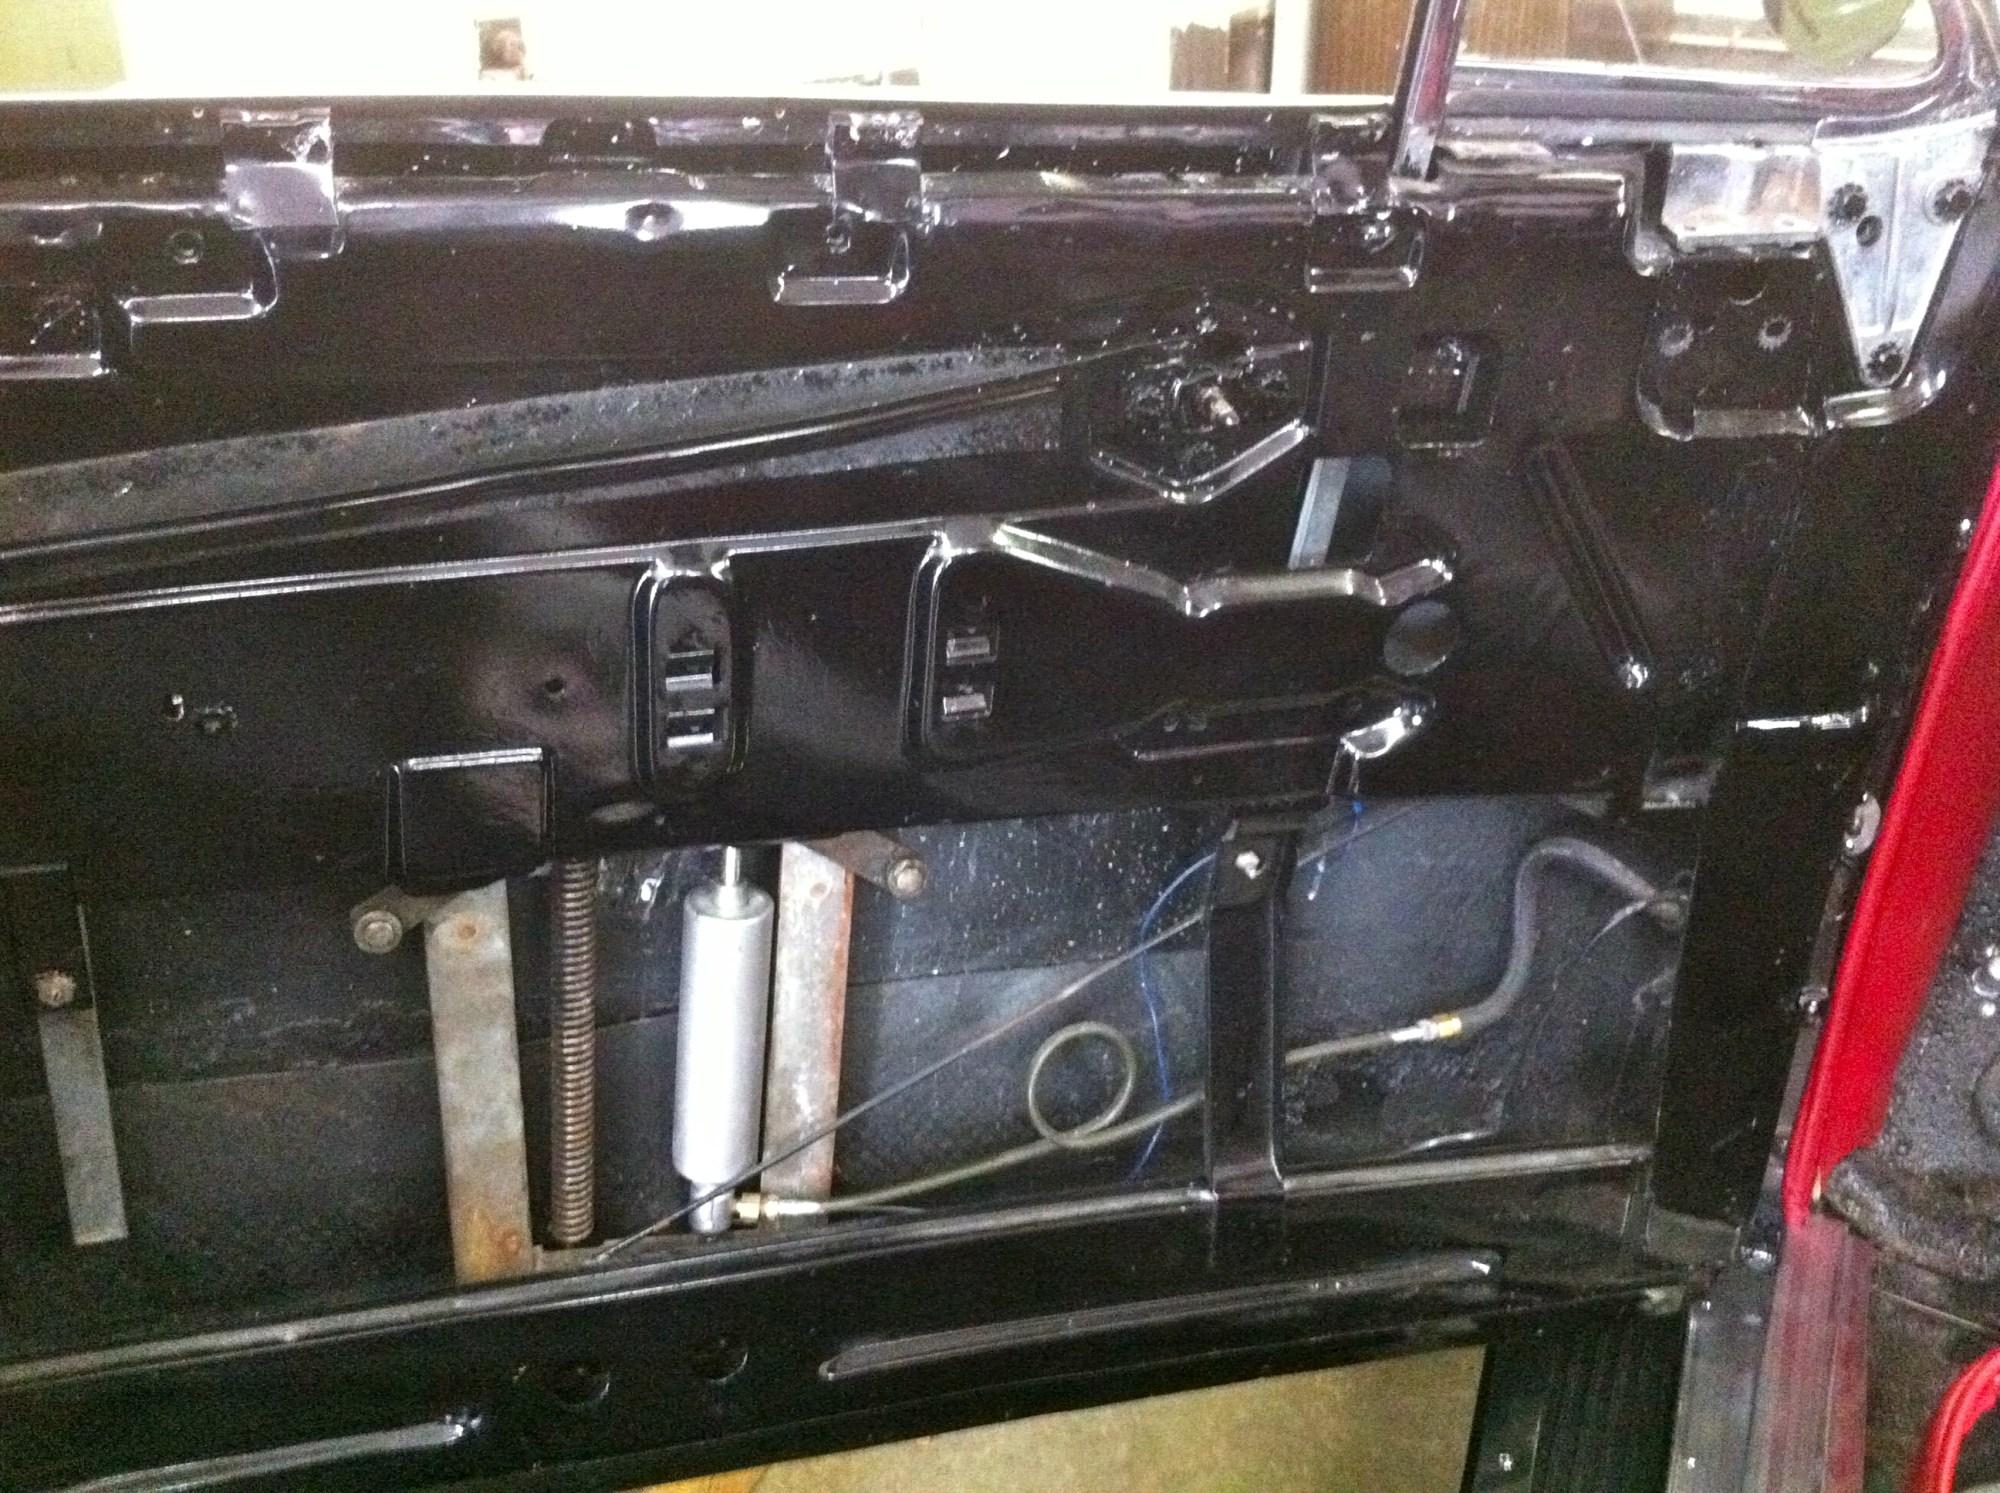 hight resolution of file inside buick drivers door showing hydraulic power window lift jpg